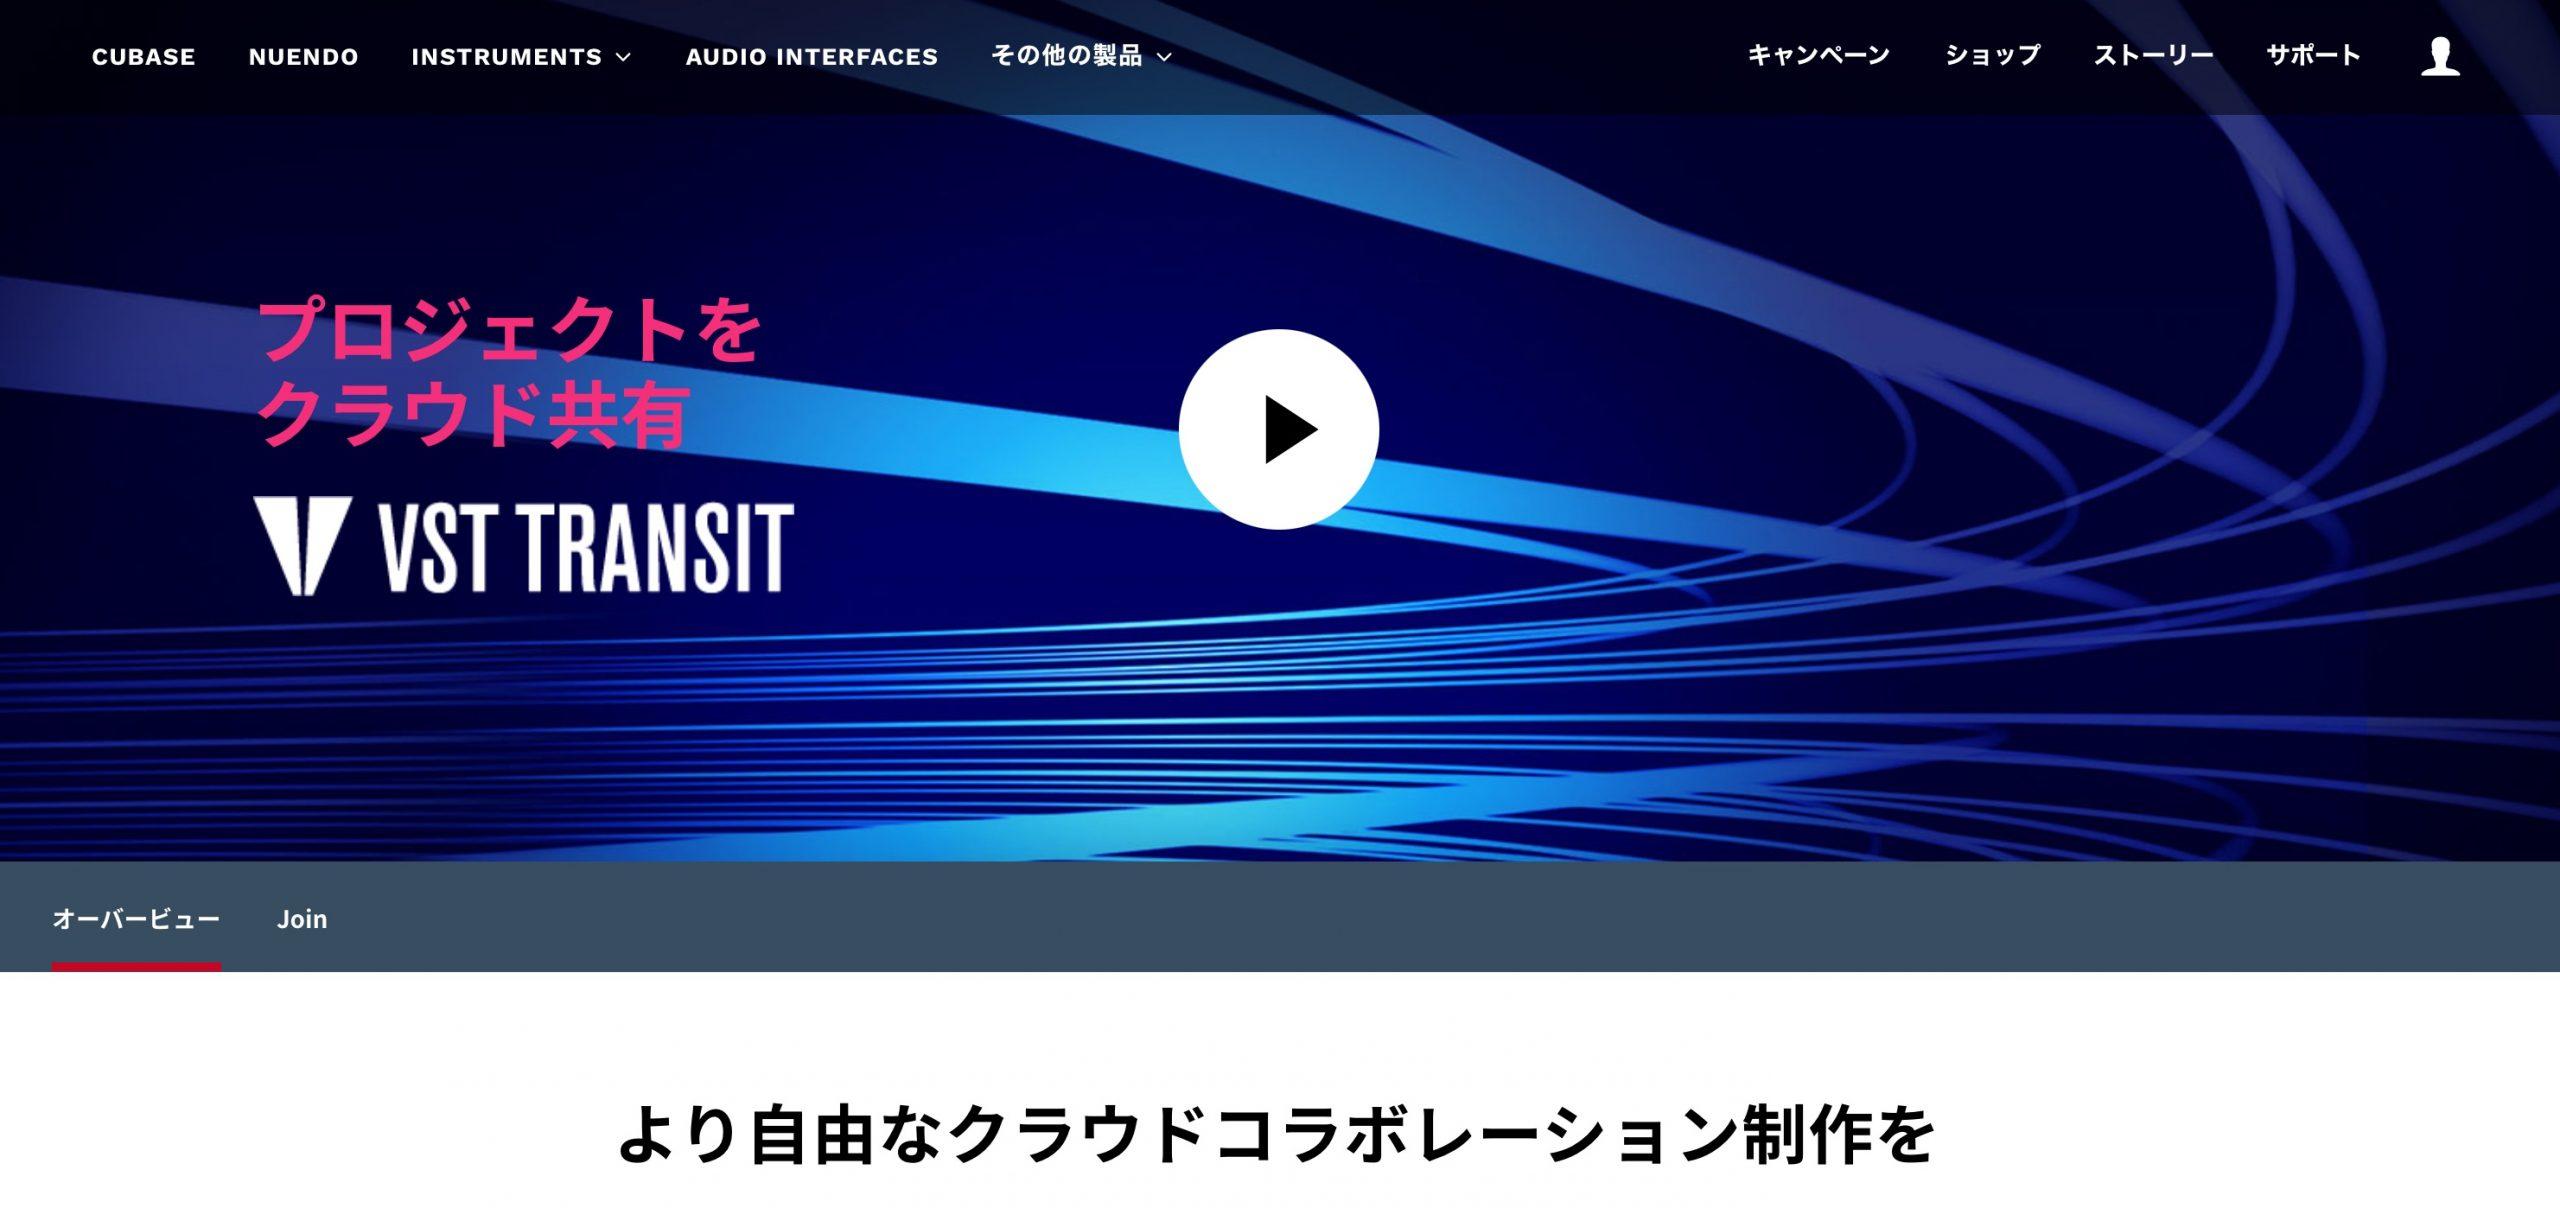 VST_TRANSIT